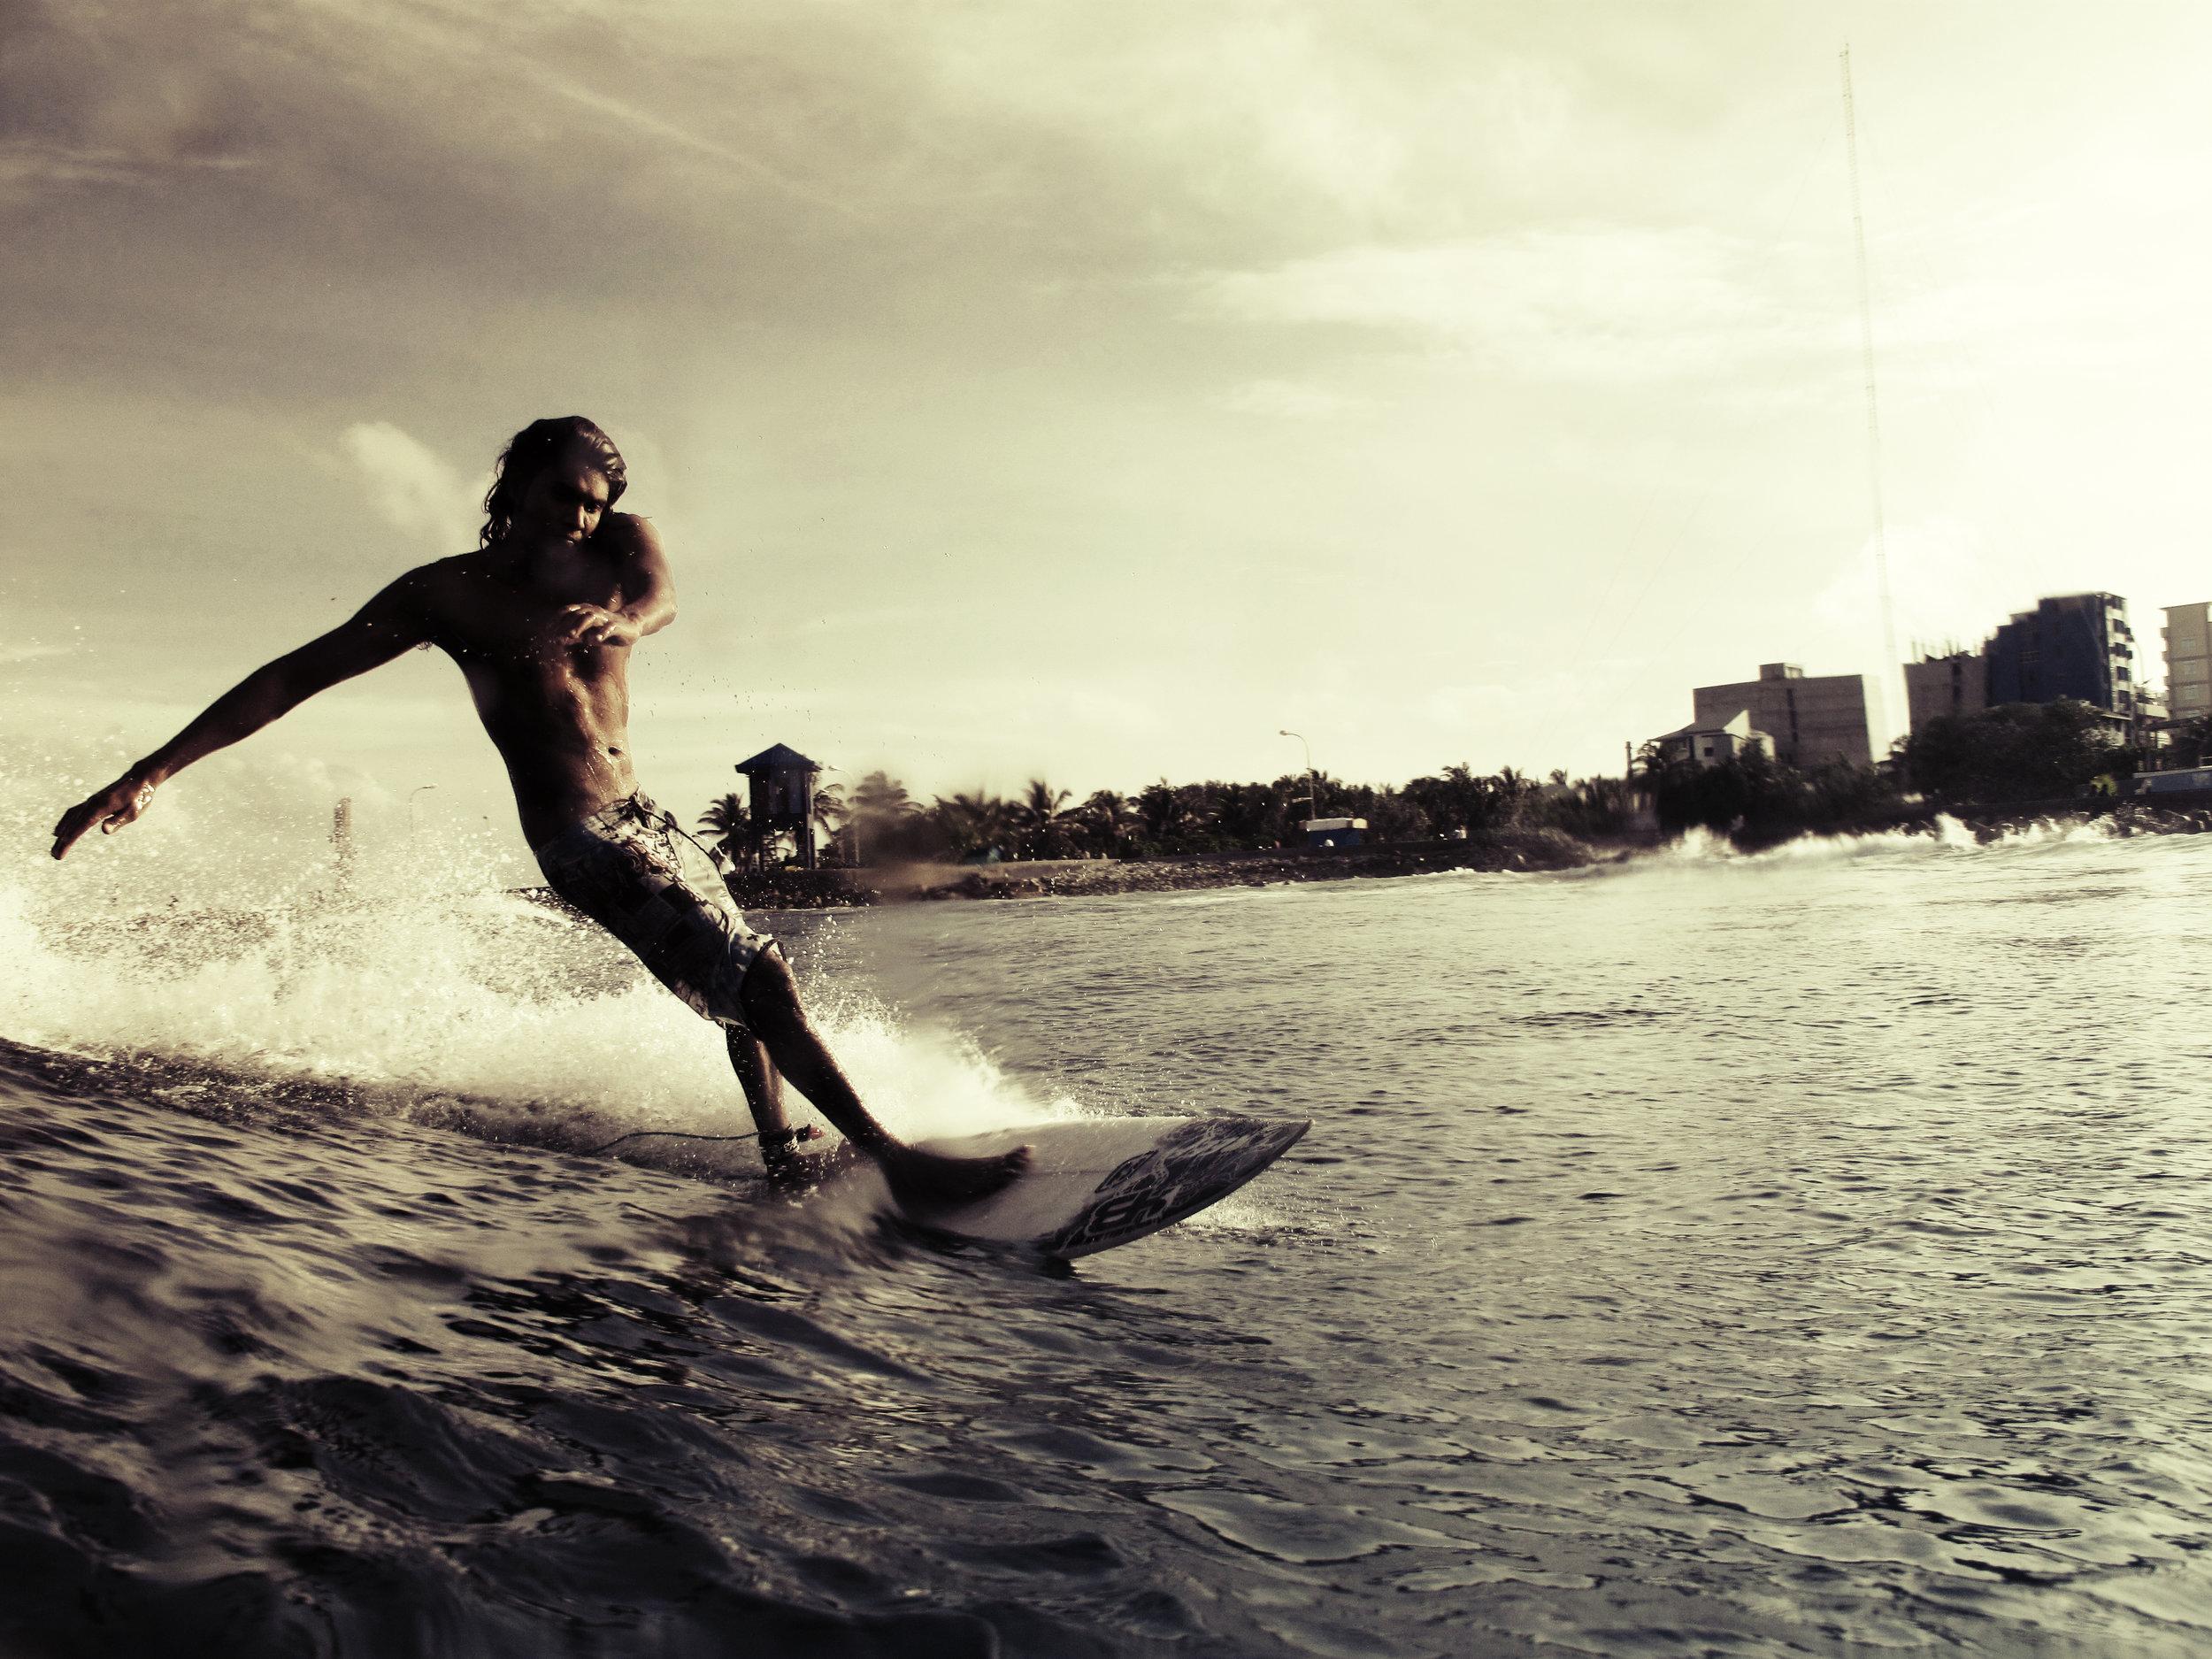 2009-05-26 - Male' City - Raalhugandu - Canon Powershot G10 - - Untitled (fuku surf).jpg